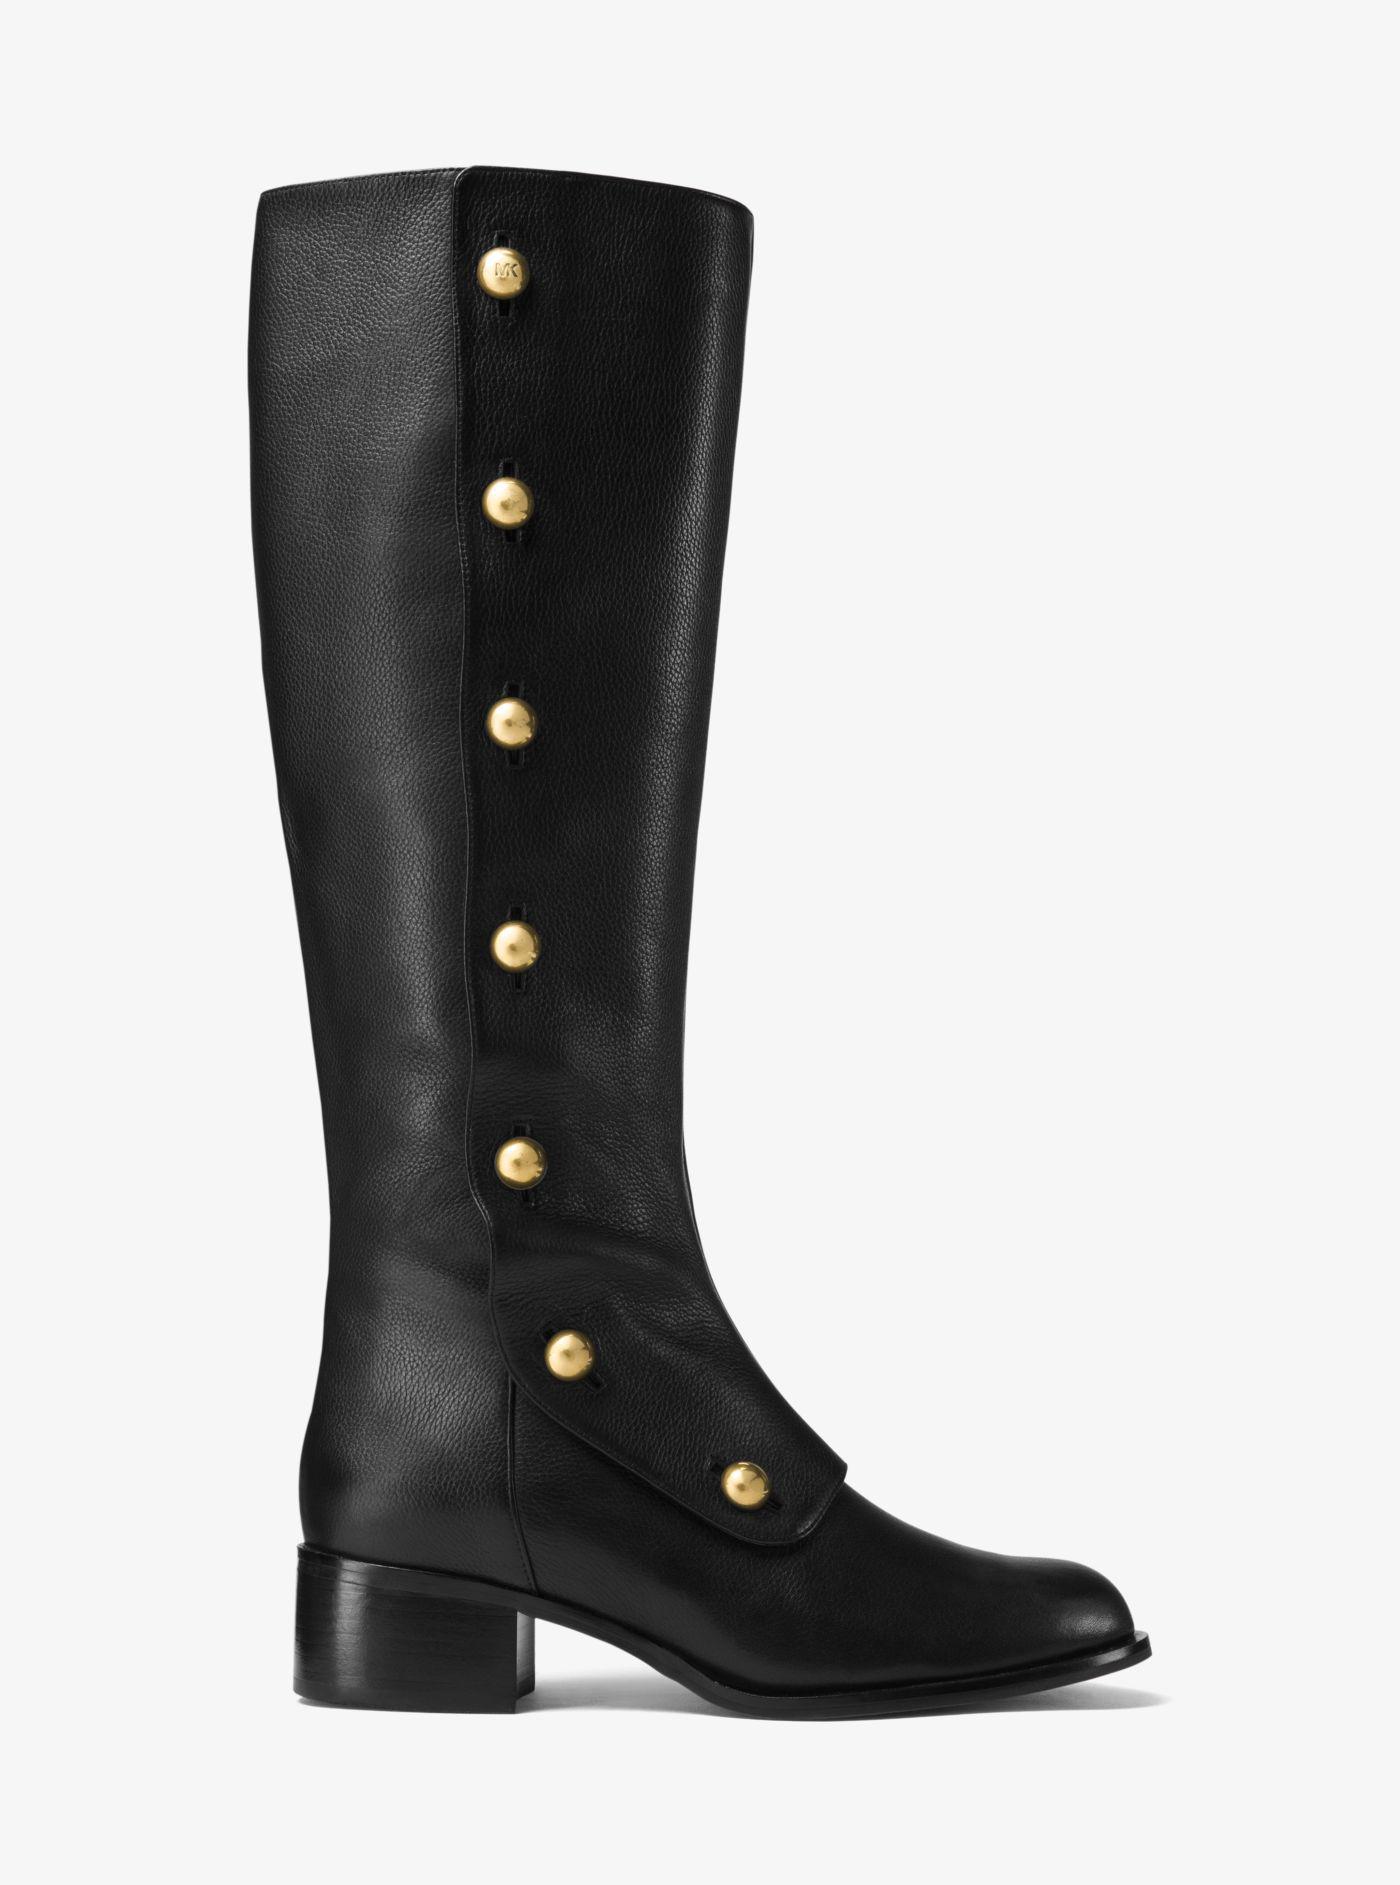 c4db0062330 Michael Kors Black Maisie Leather Boot